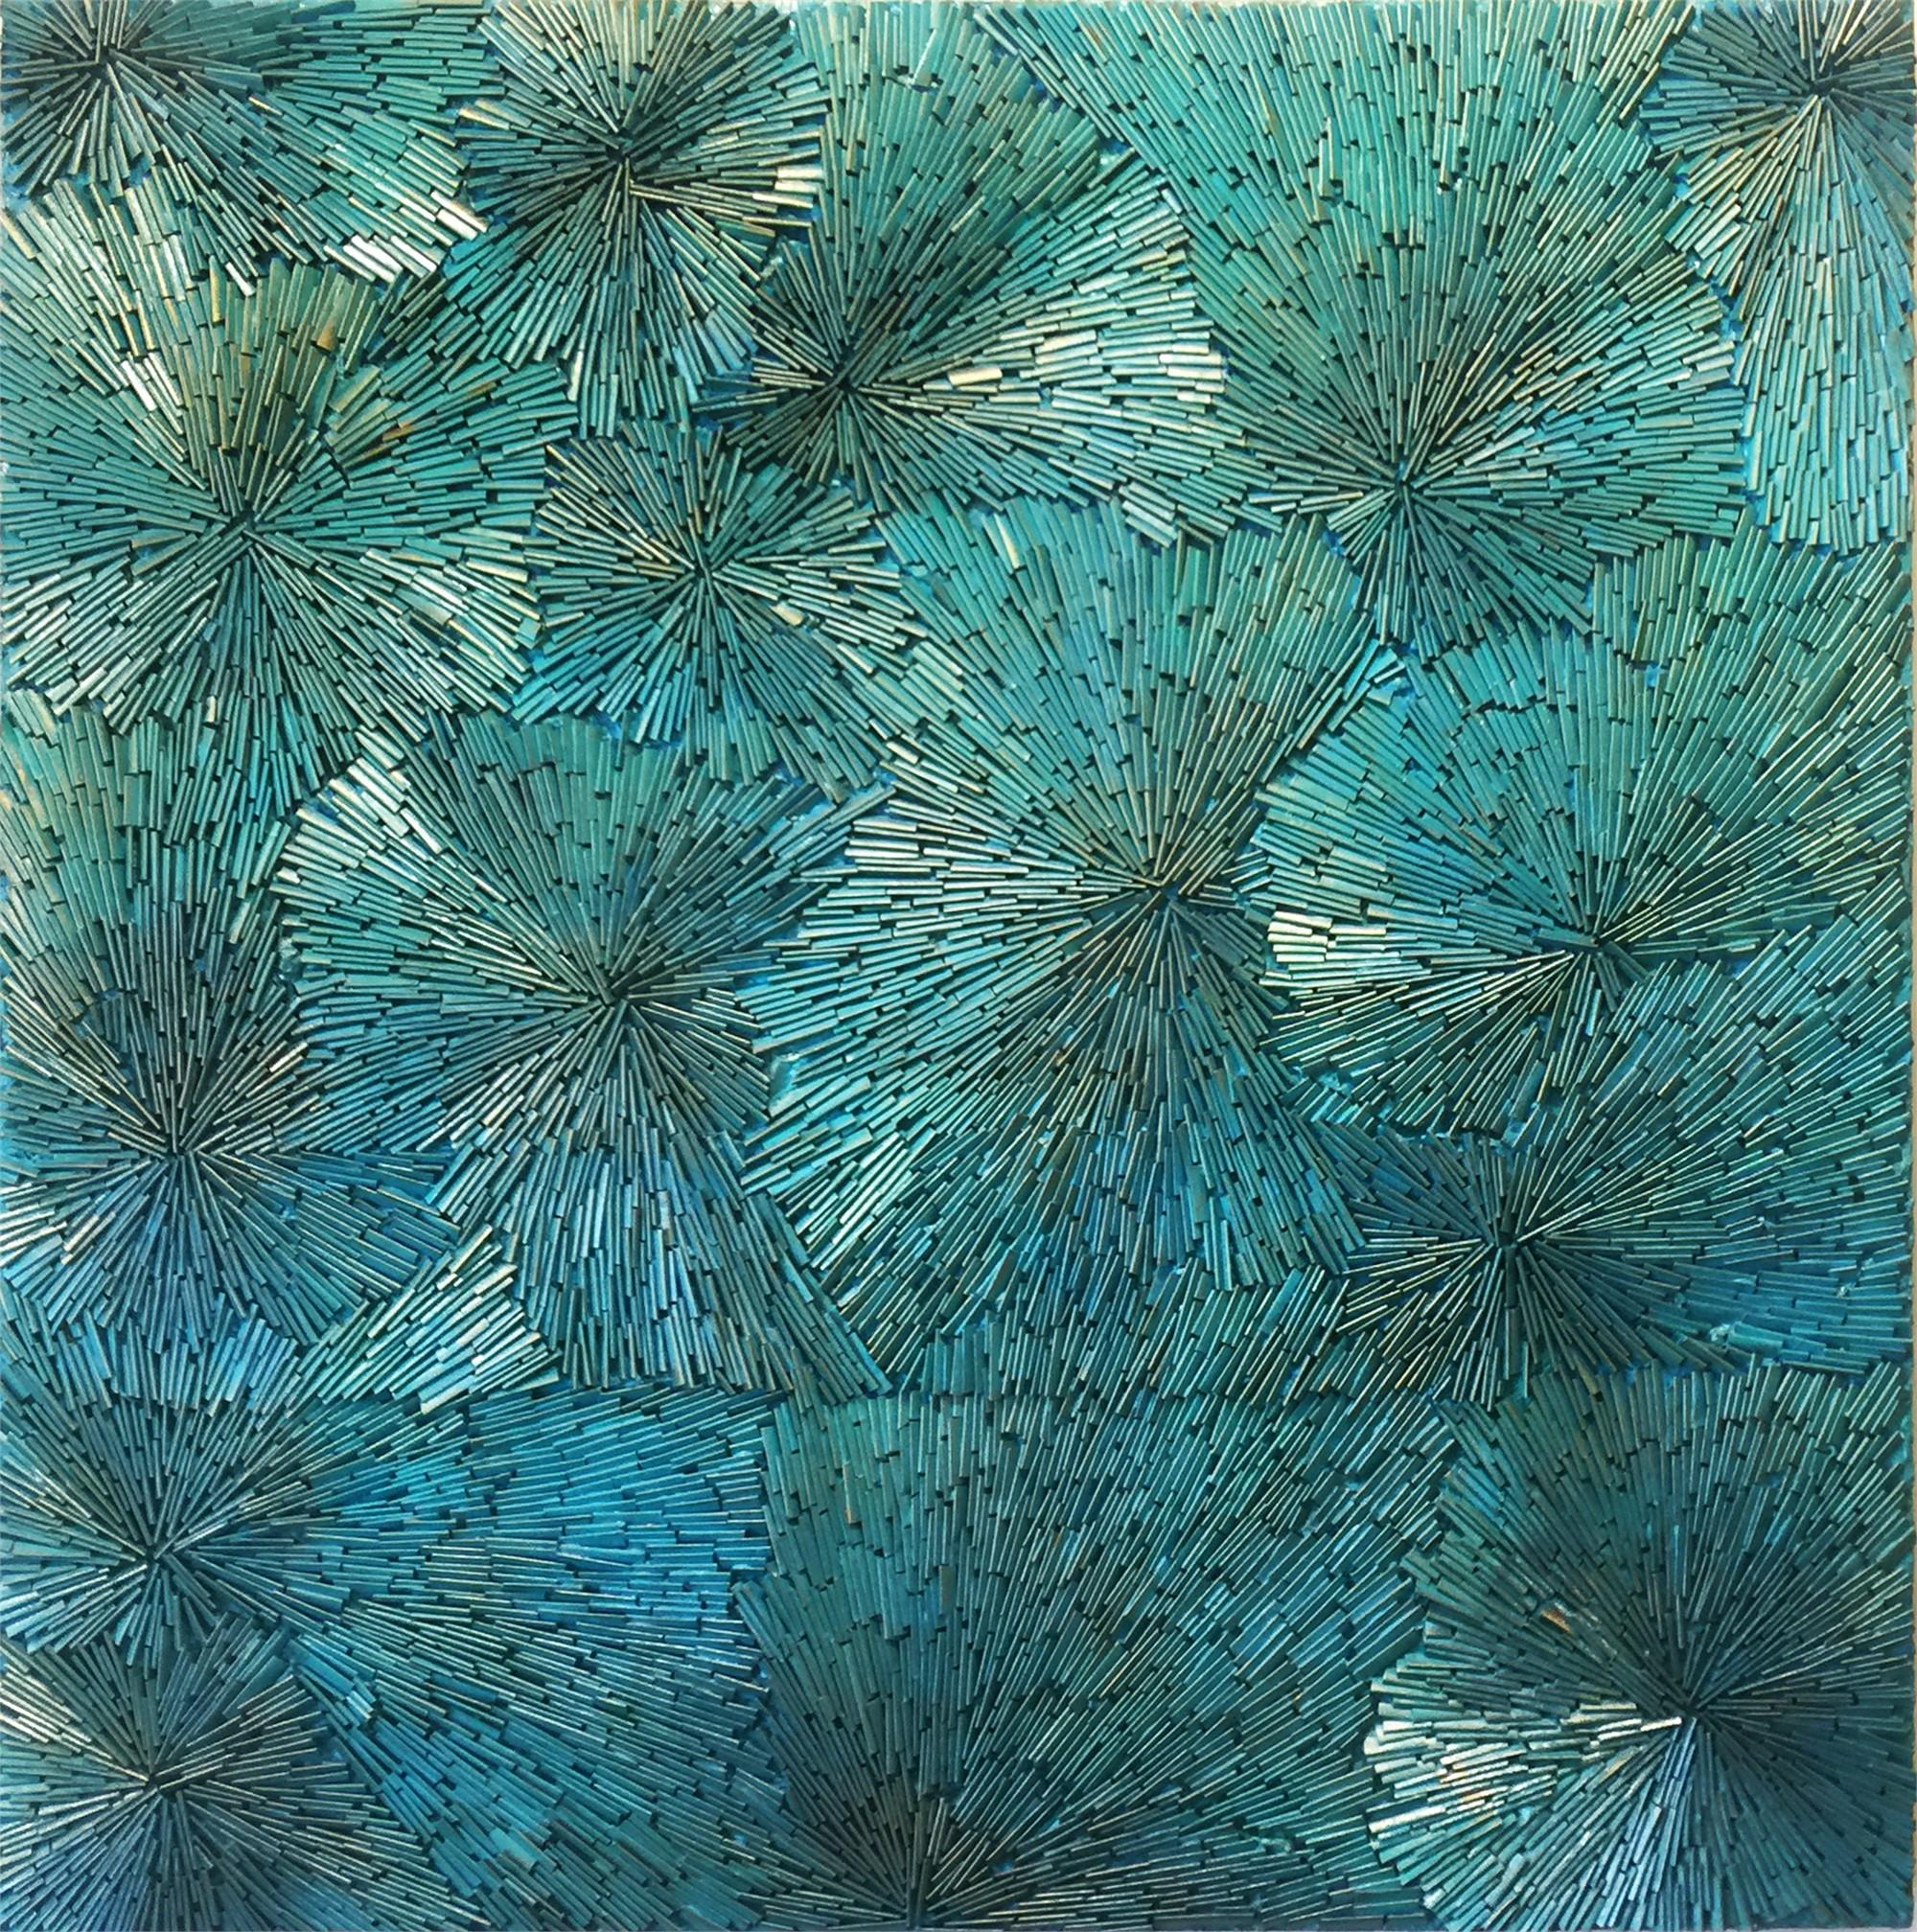 Frozen Waters by Sabine Stromeyer